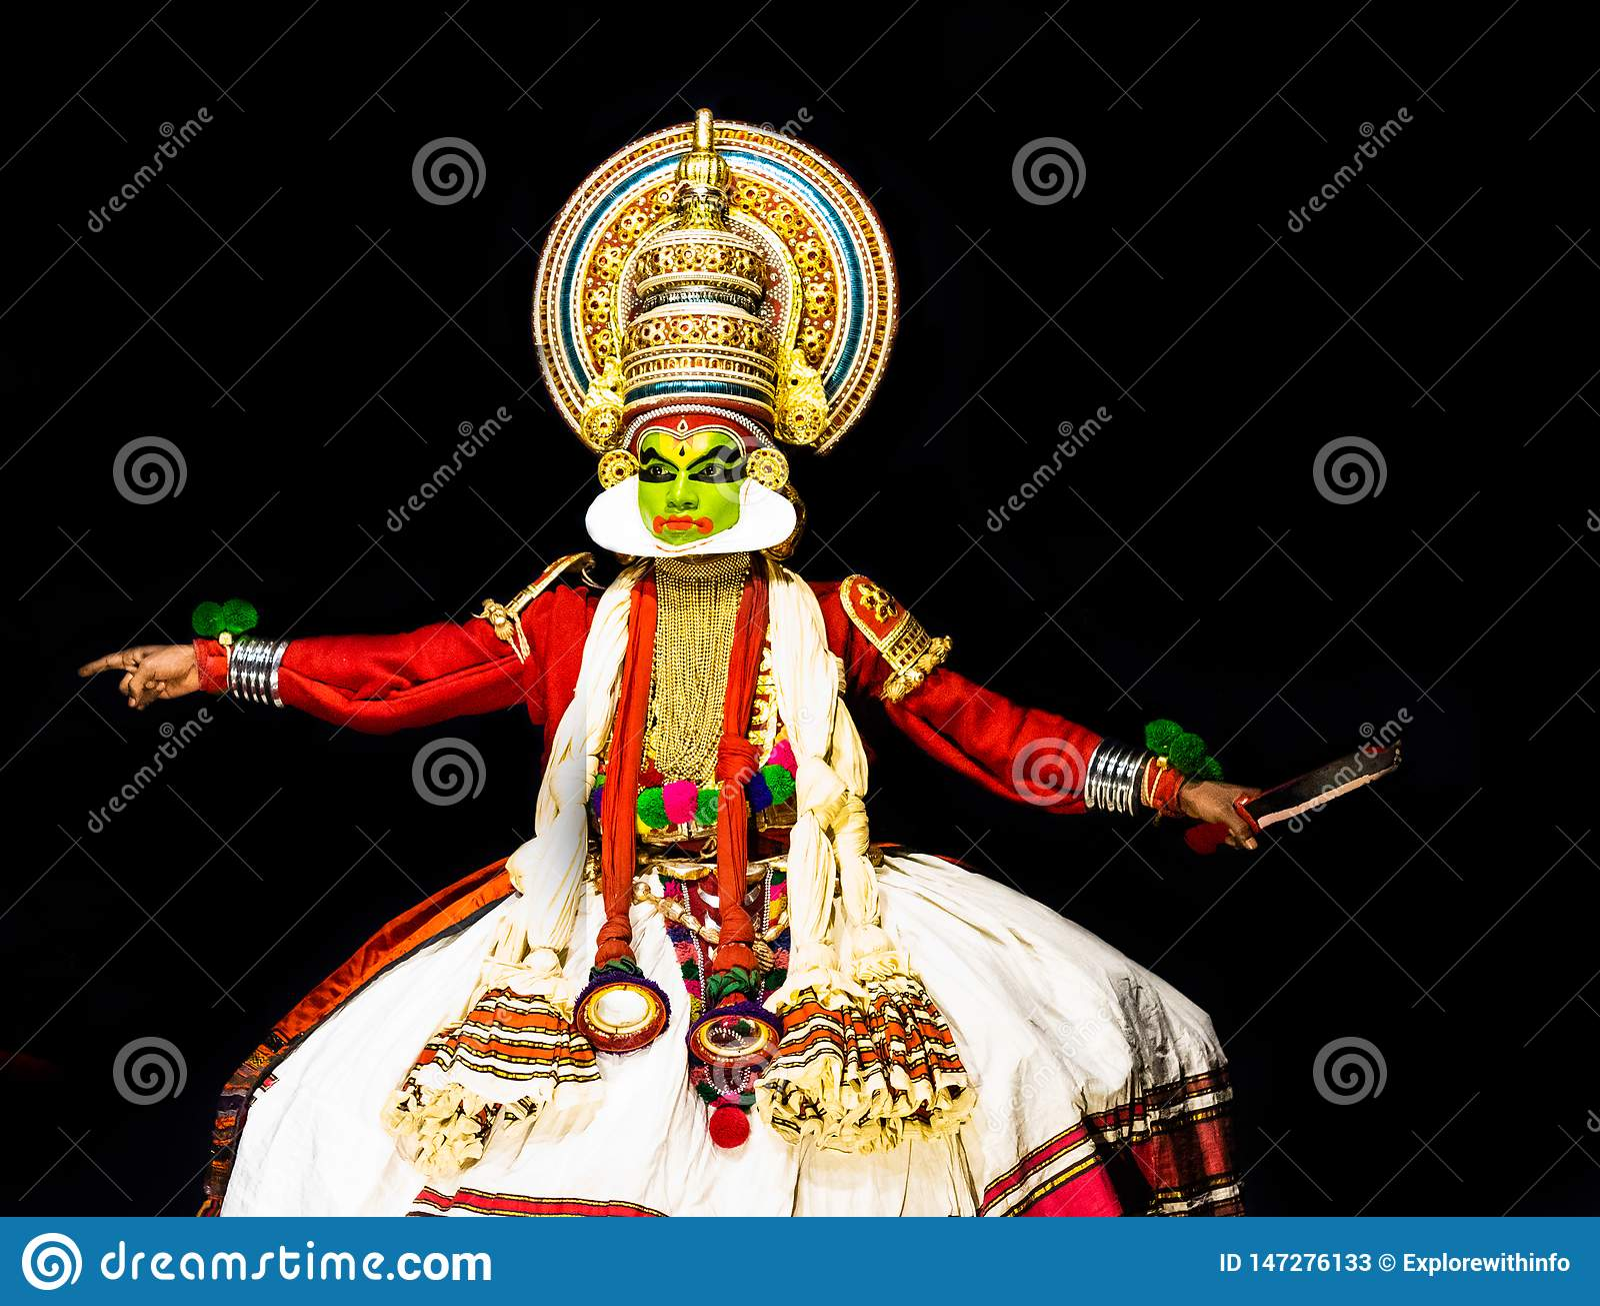 Kathakali Kerala Classical Dance Mens Body And Facial